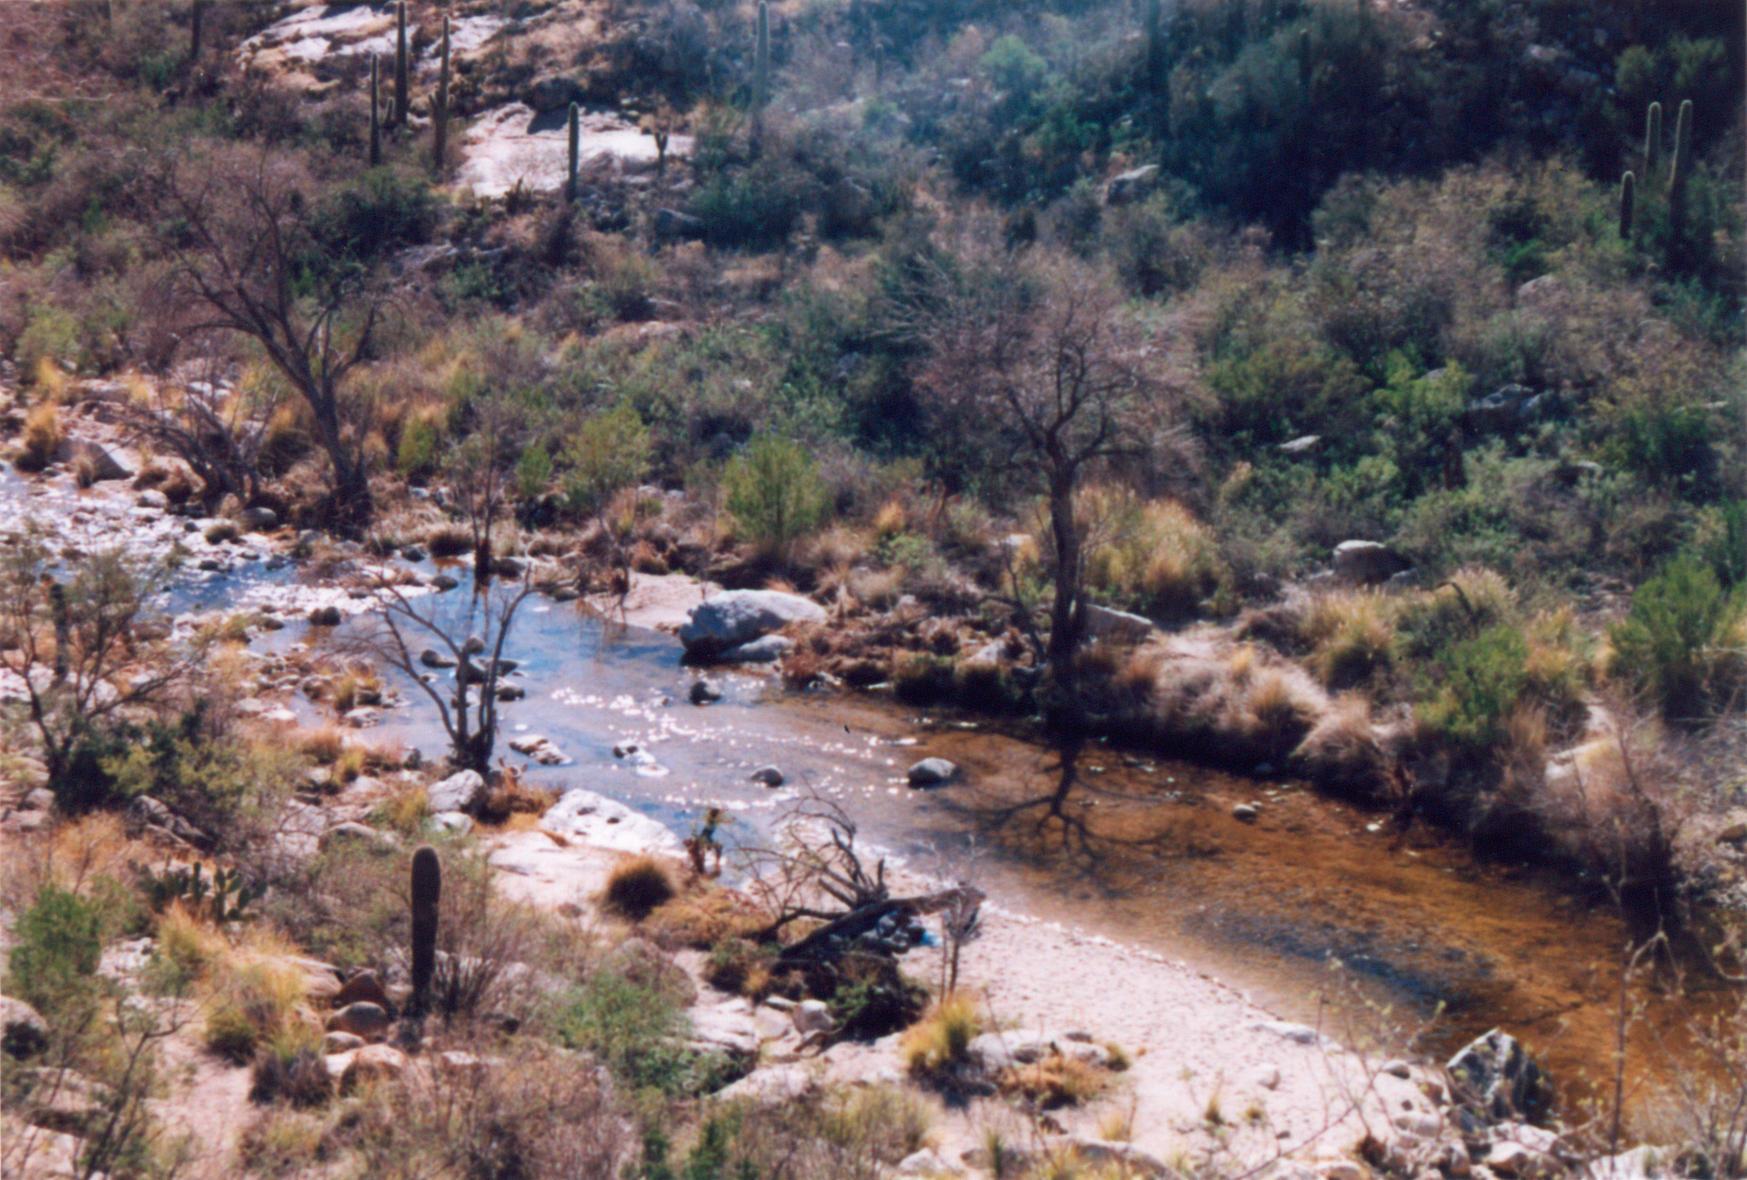 027 Stream - Sabino Canyon AZ by J2theStock